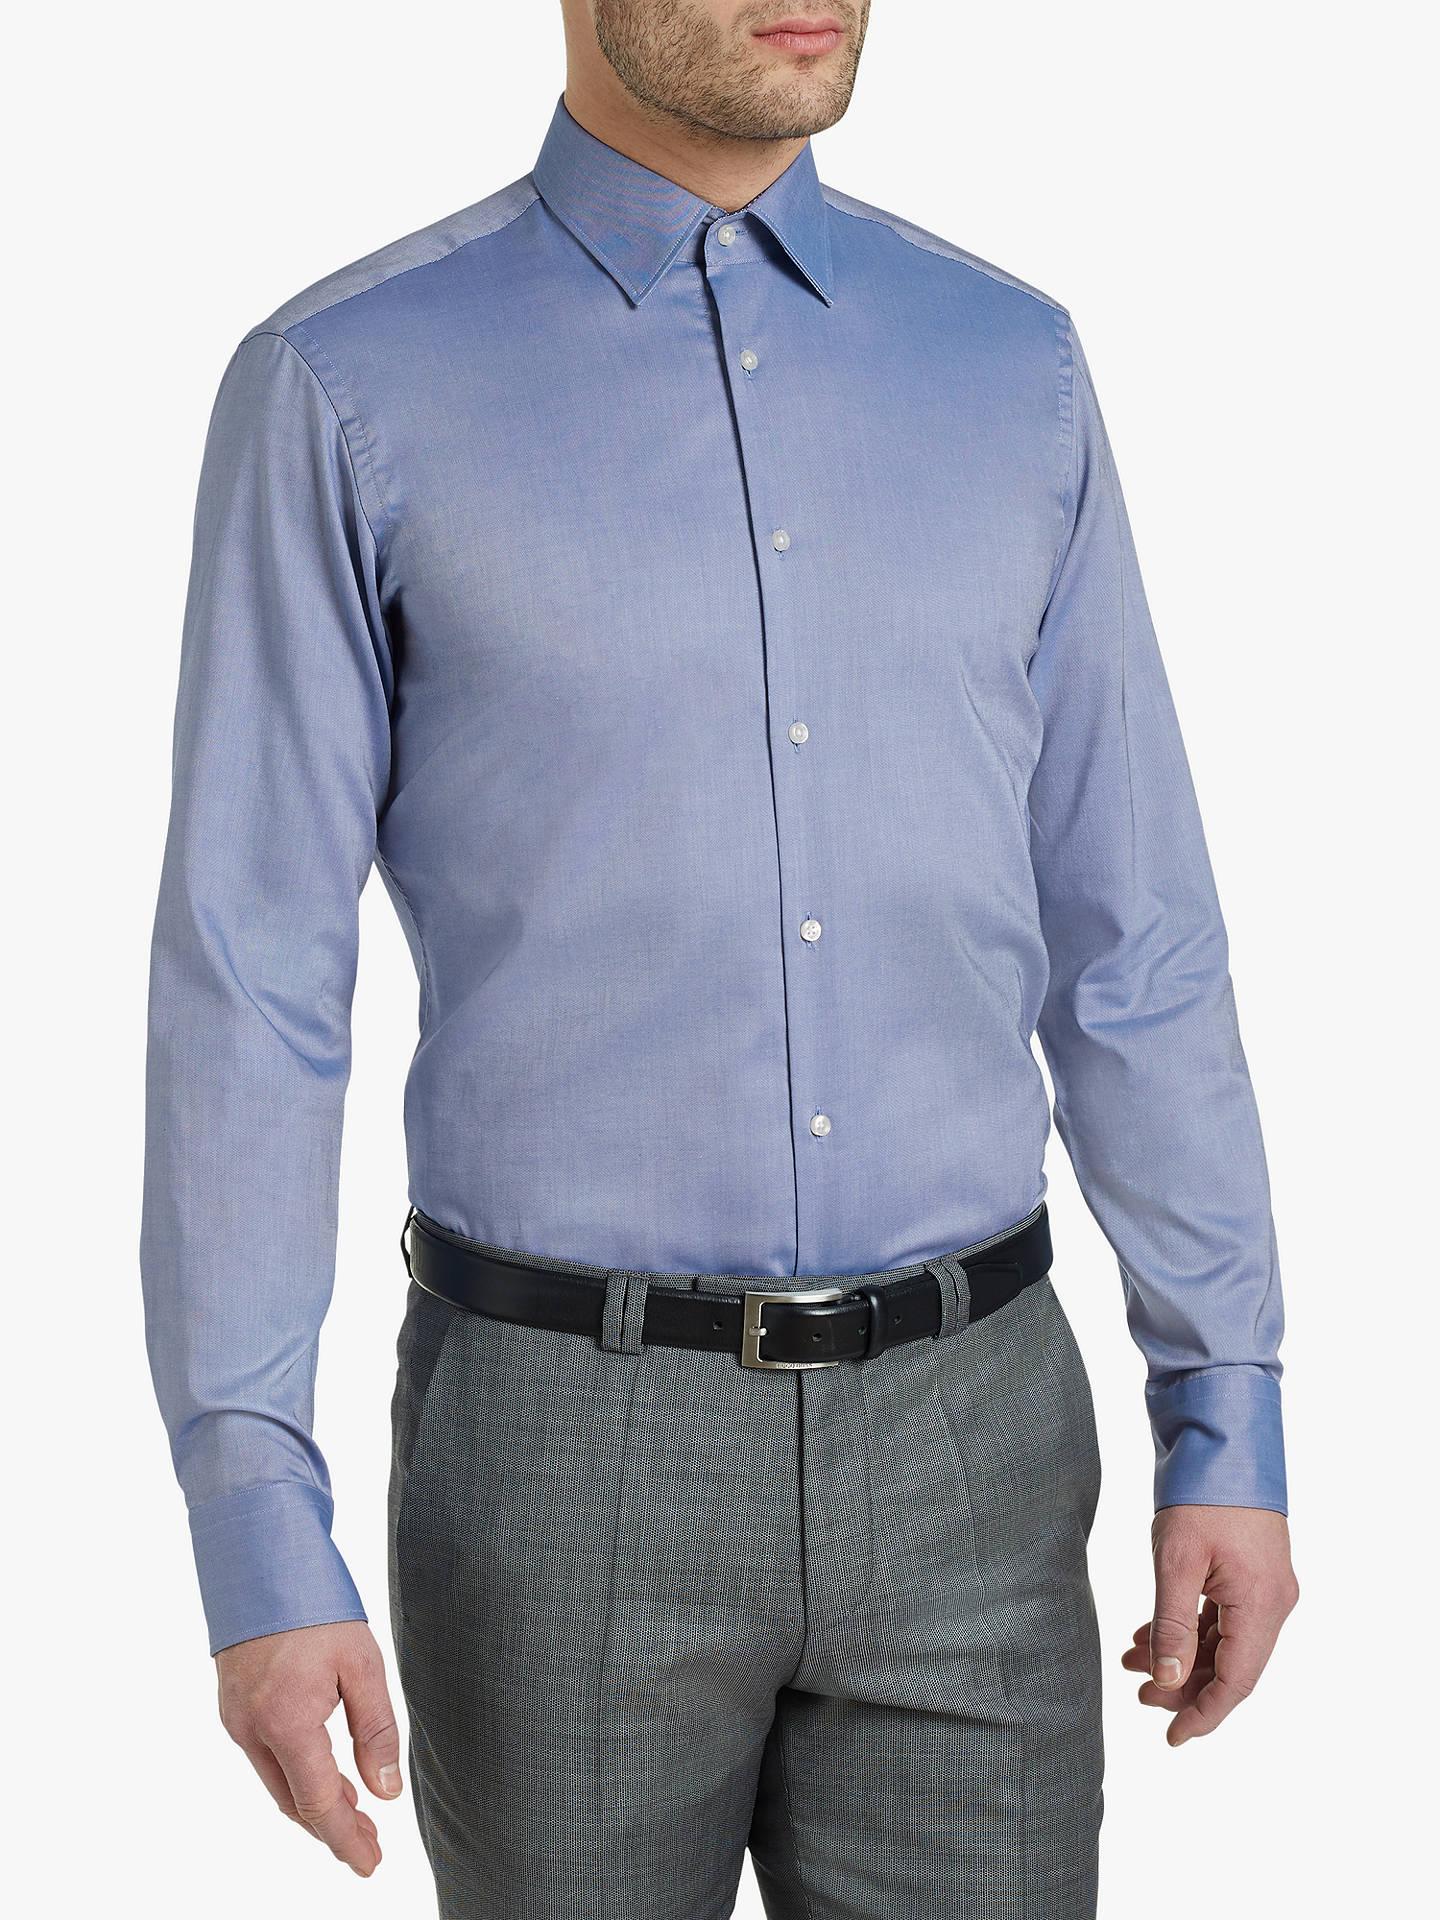 40b95514330 HUGO by Hugo Boss Velwin Oxford Shirt, Navy Blue at John Lewis ...